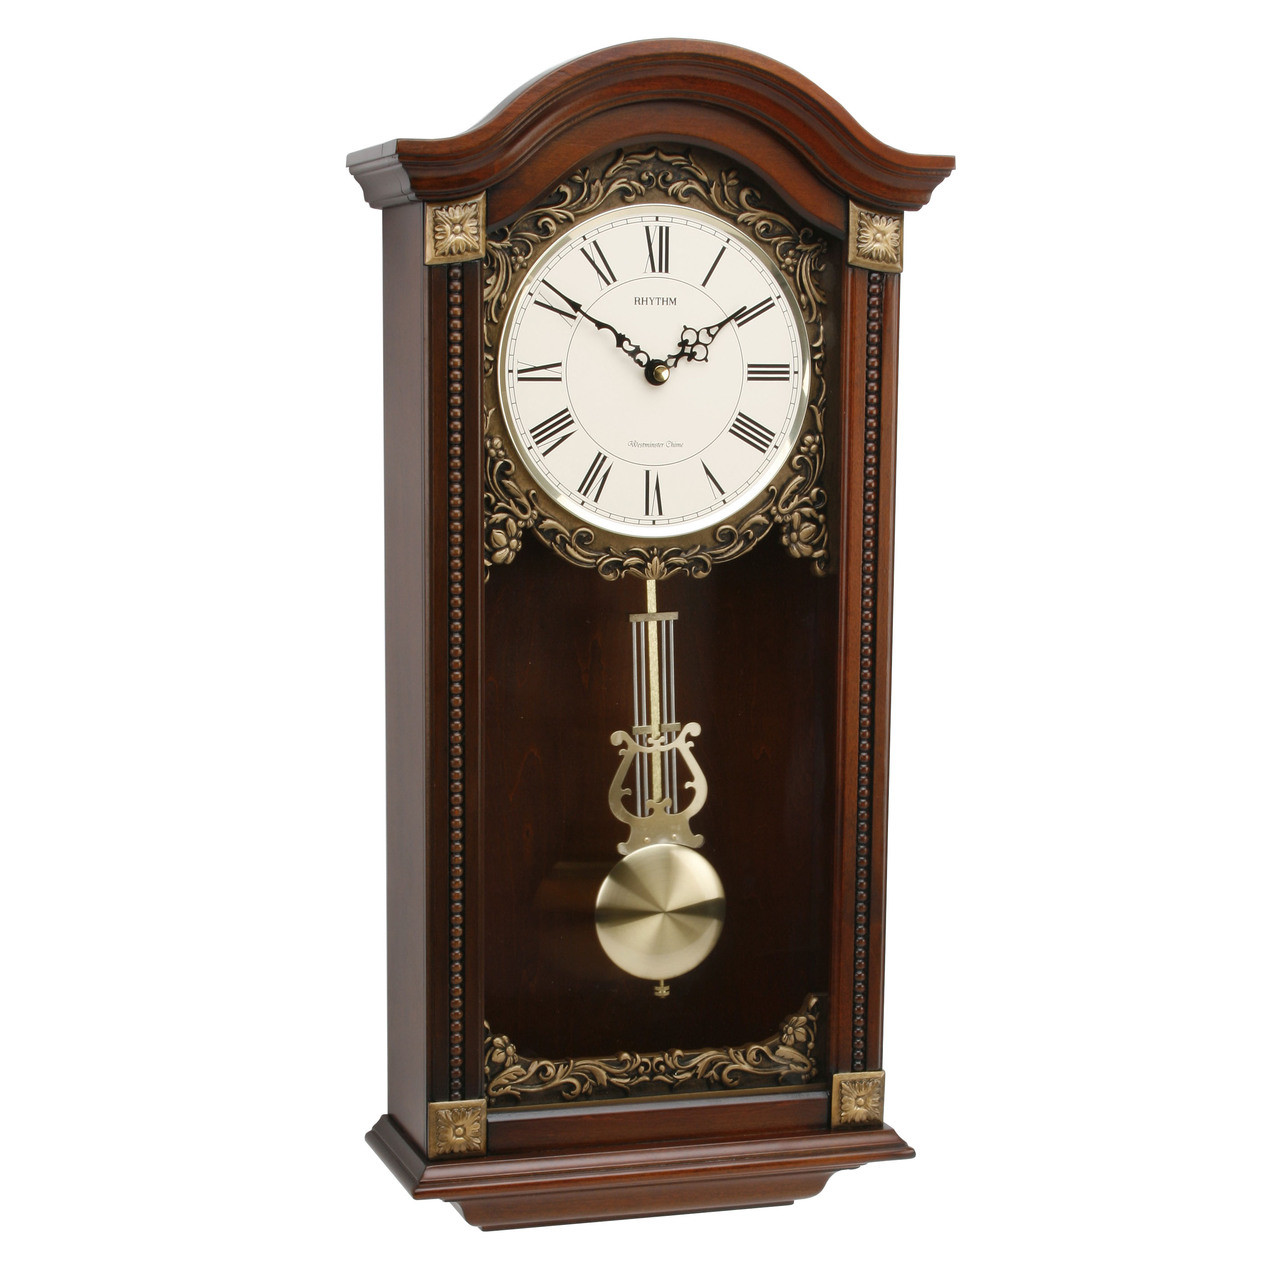 Rhythm Wood Pendulum Wall Clock Quartz Westminster Chime CMJ524NR06